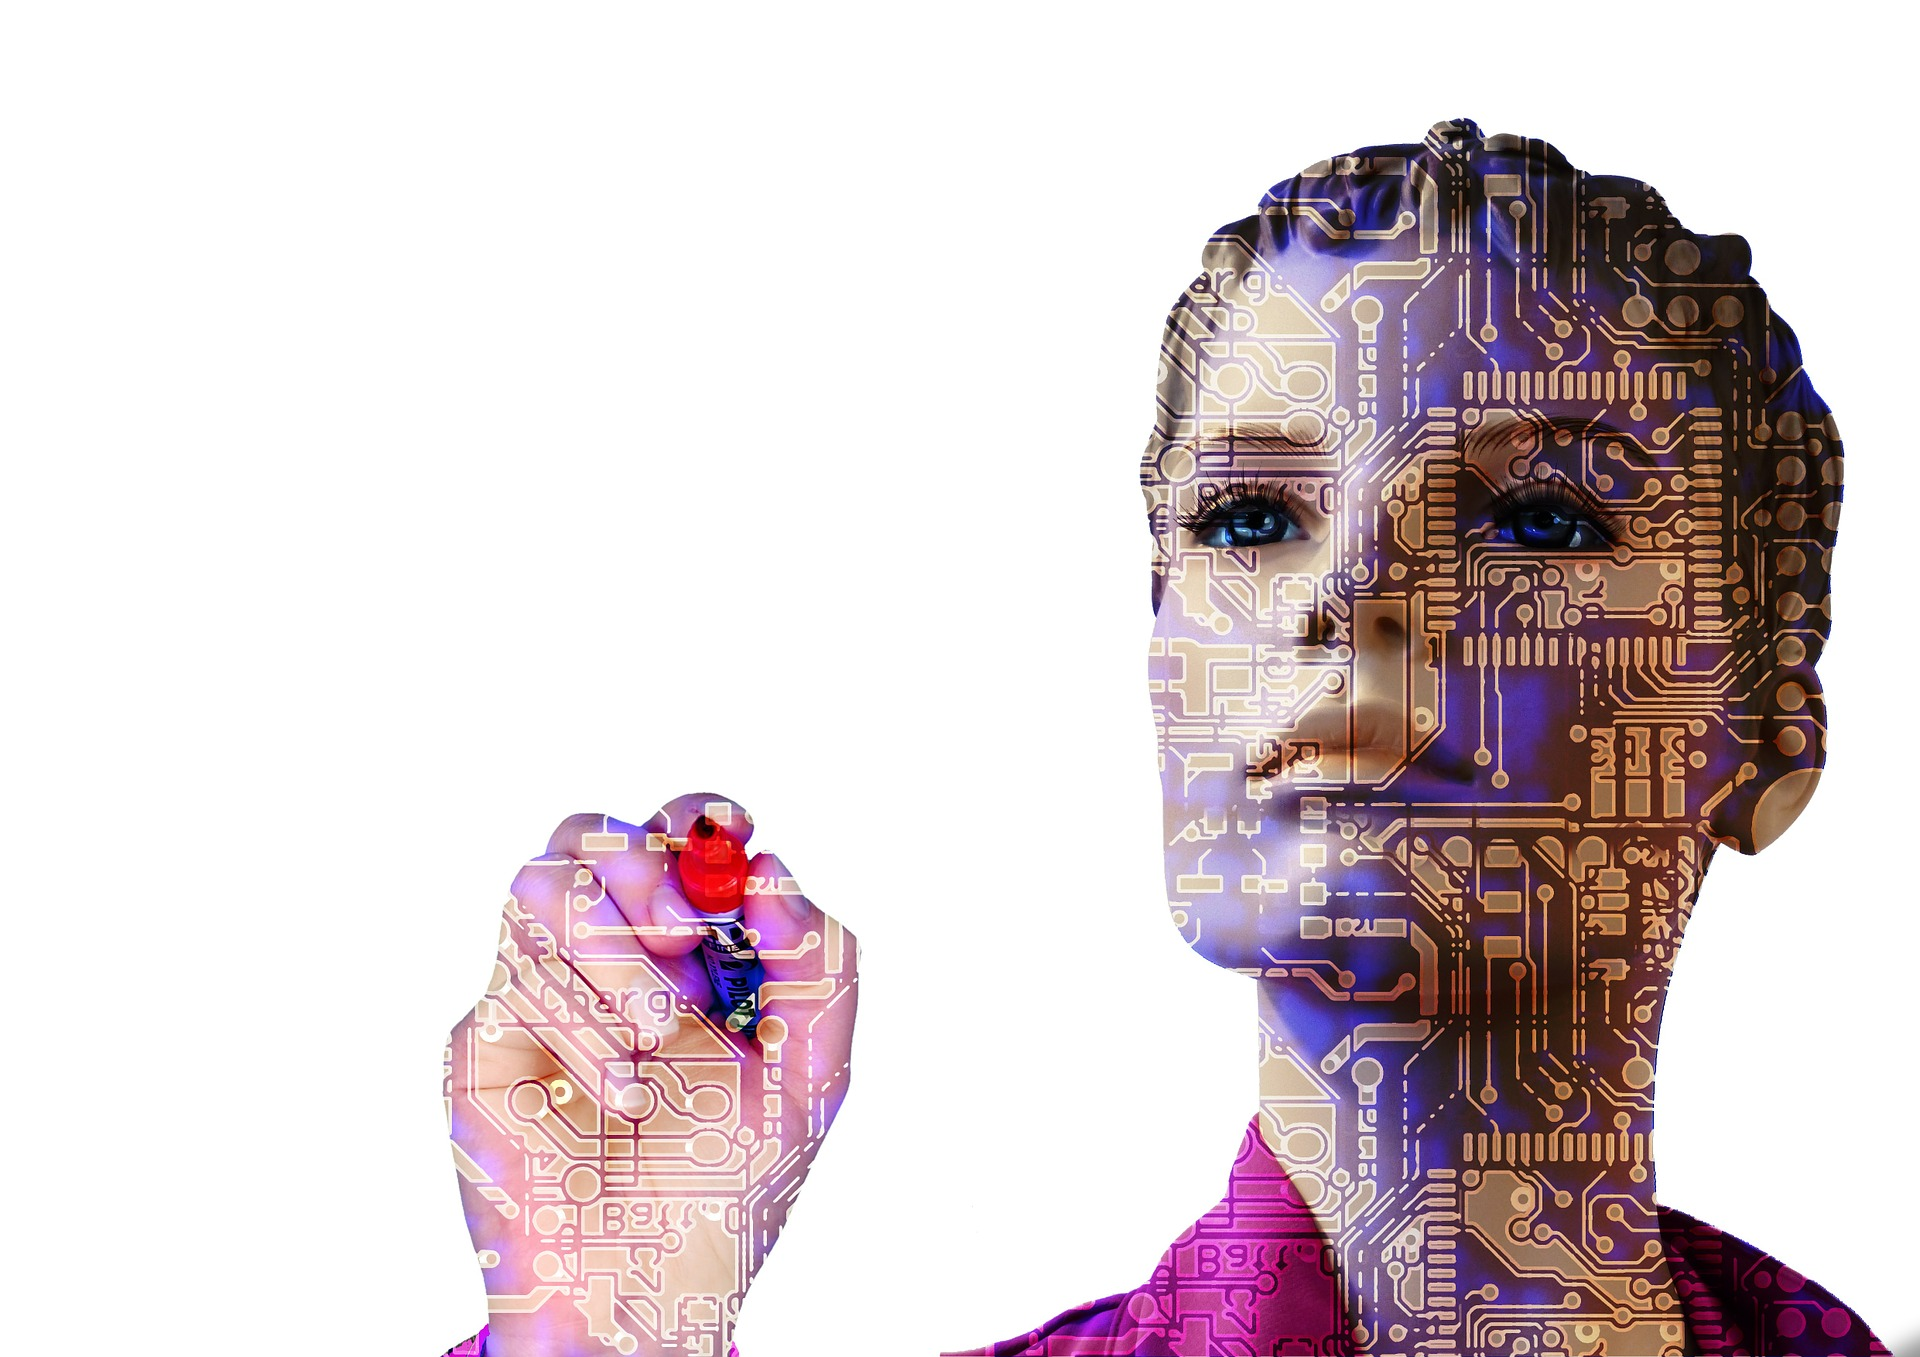 Budou lidé nahrazeni stroji?